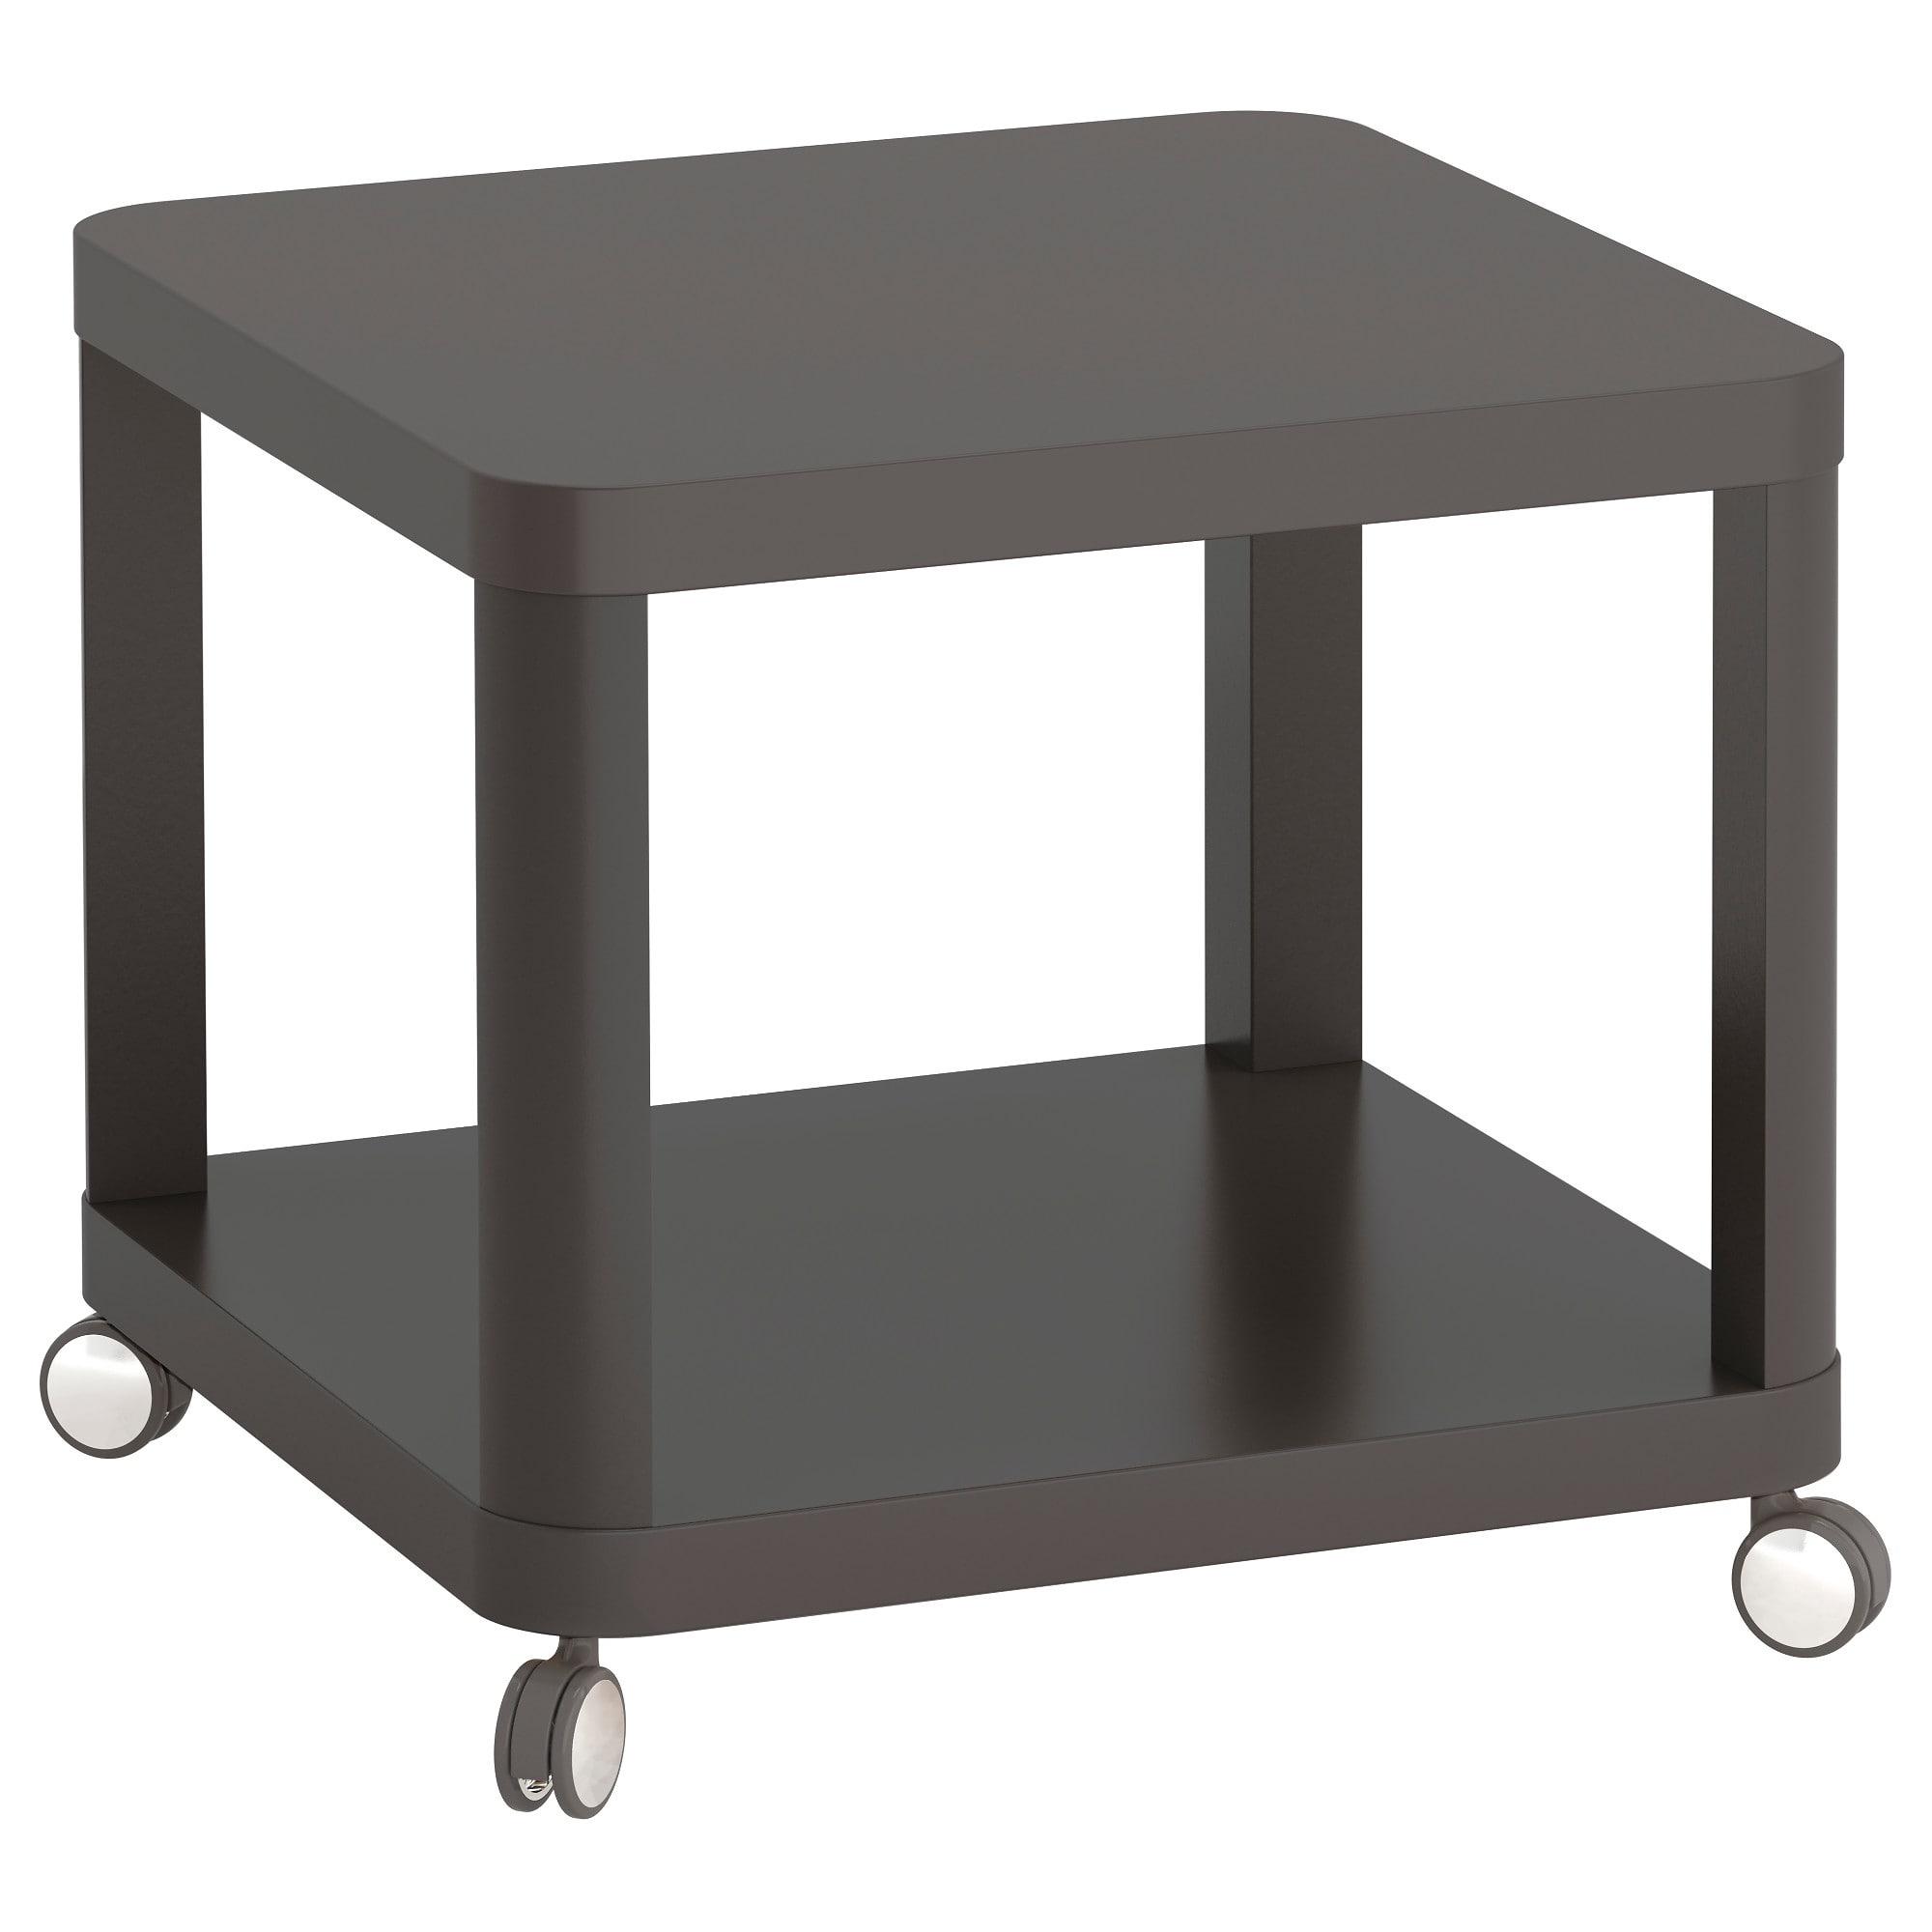 Mesa Acero Inoxidable Ikea Tqd3 Mesas Auxiliares Y Mesas Nido Pra Online Ikea